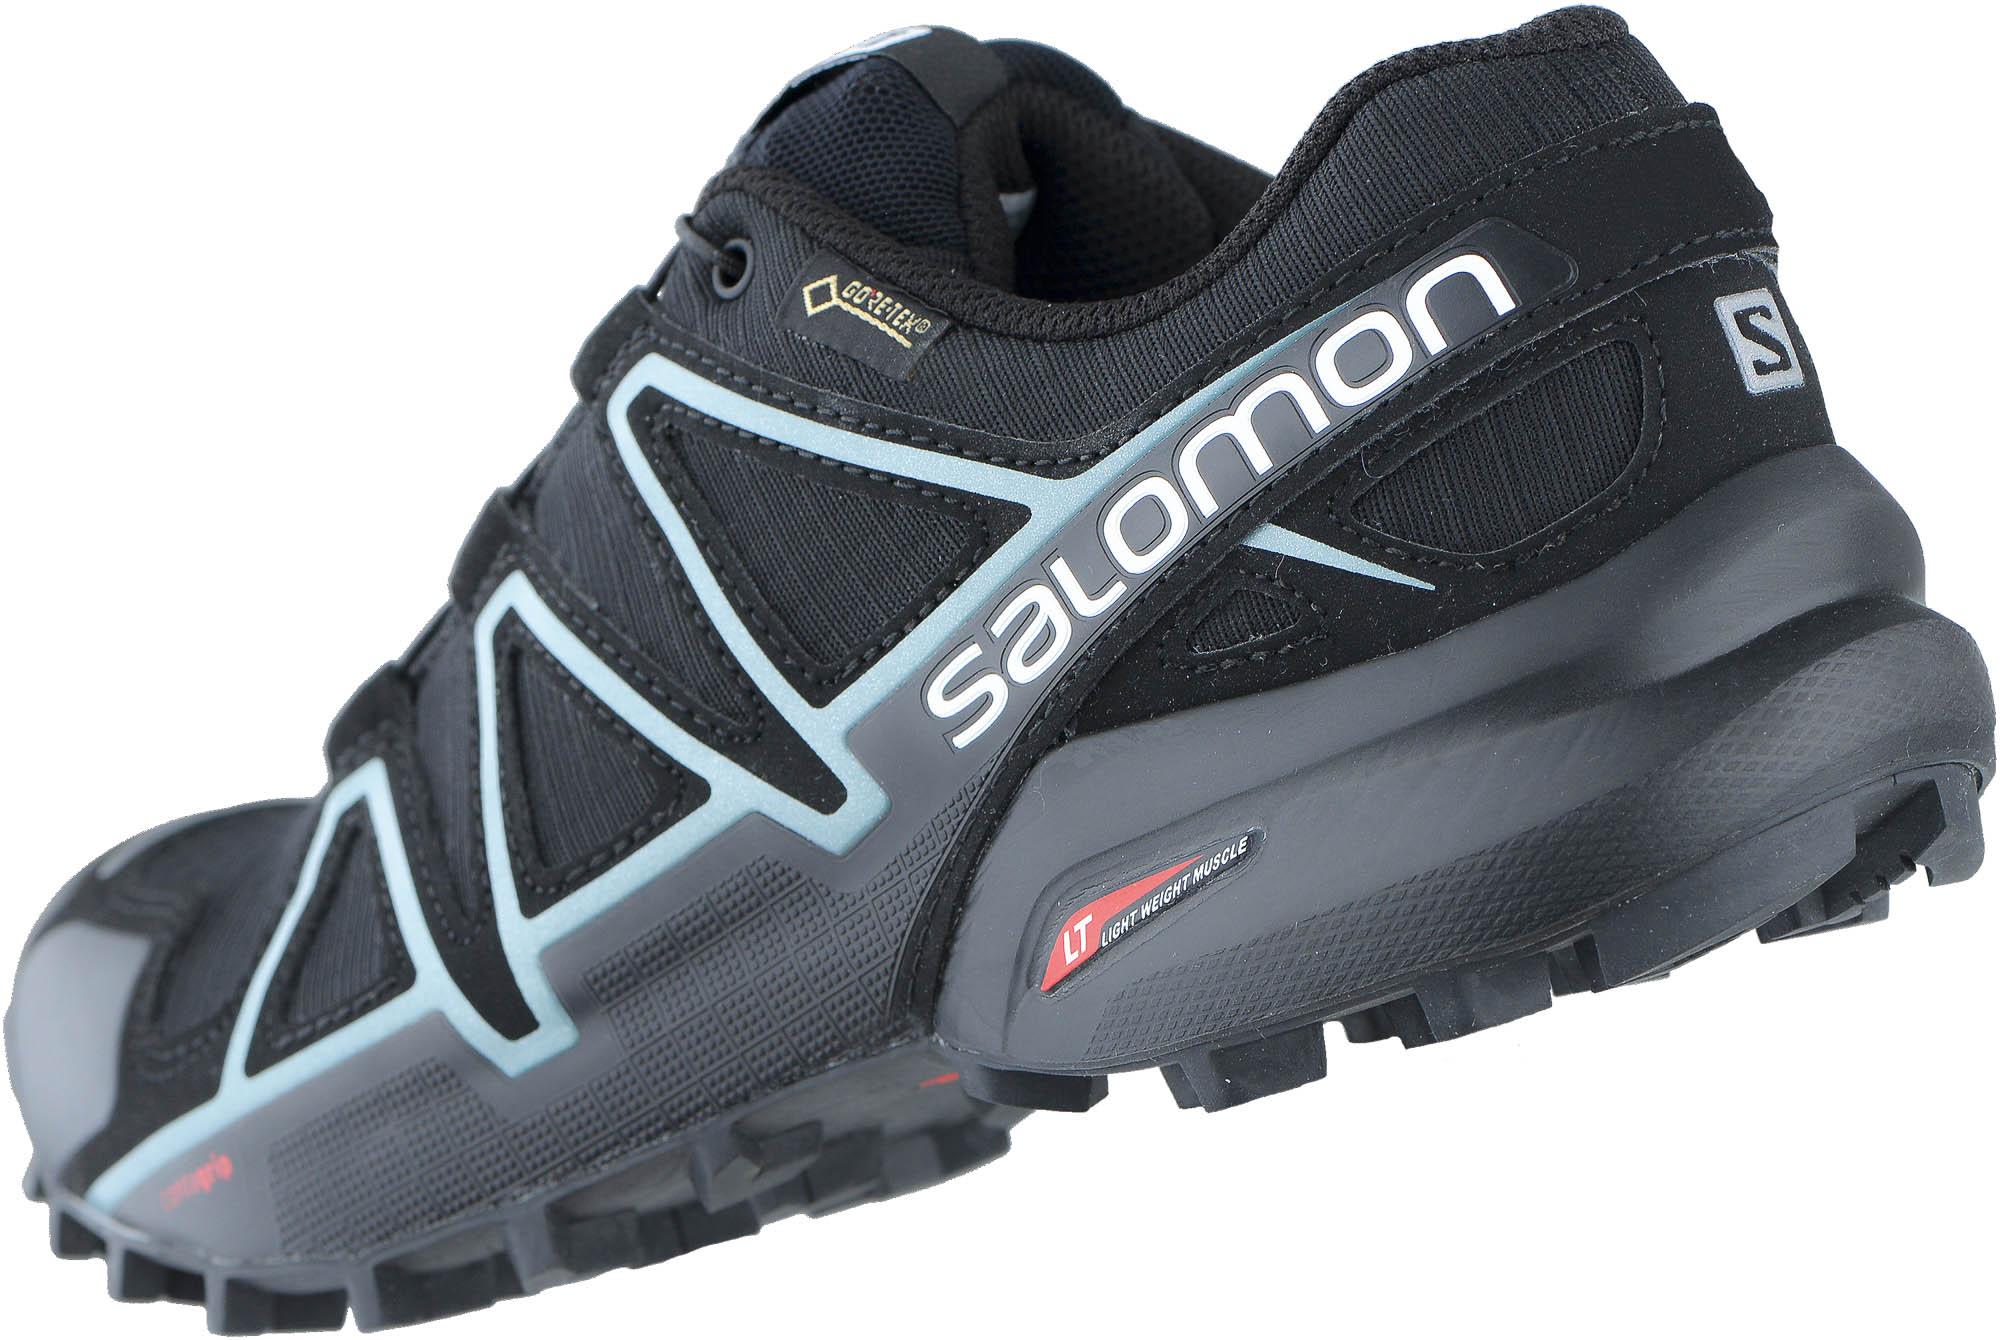 SALOMON Speedcross 4 GTX Trekkingschuh black